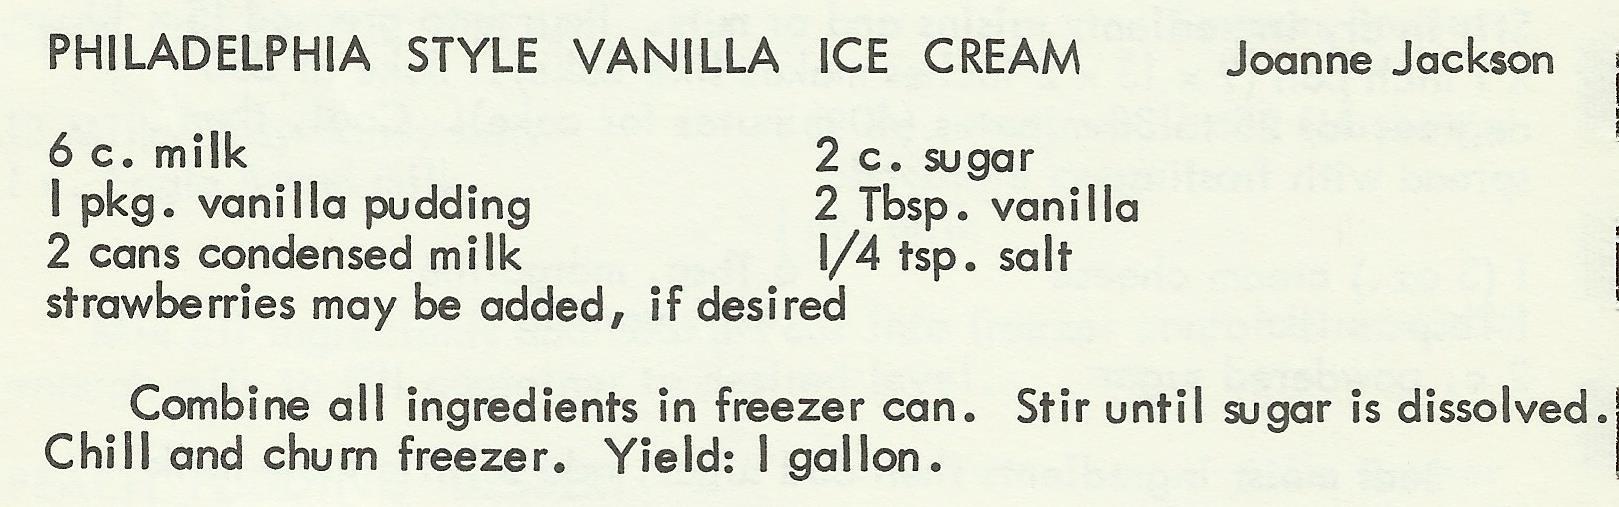 Philadelphia Style Vanilla Ice Cream